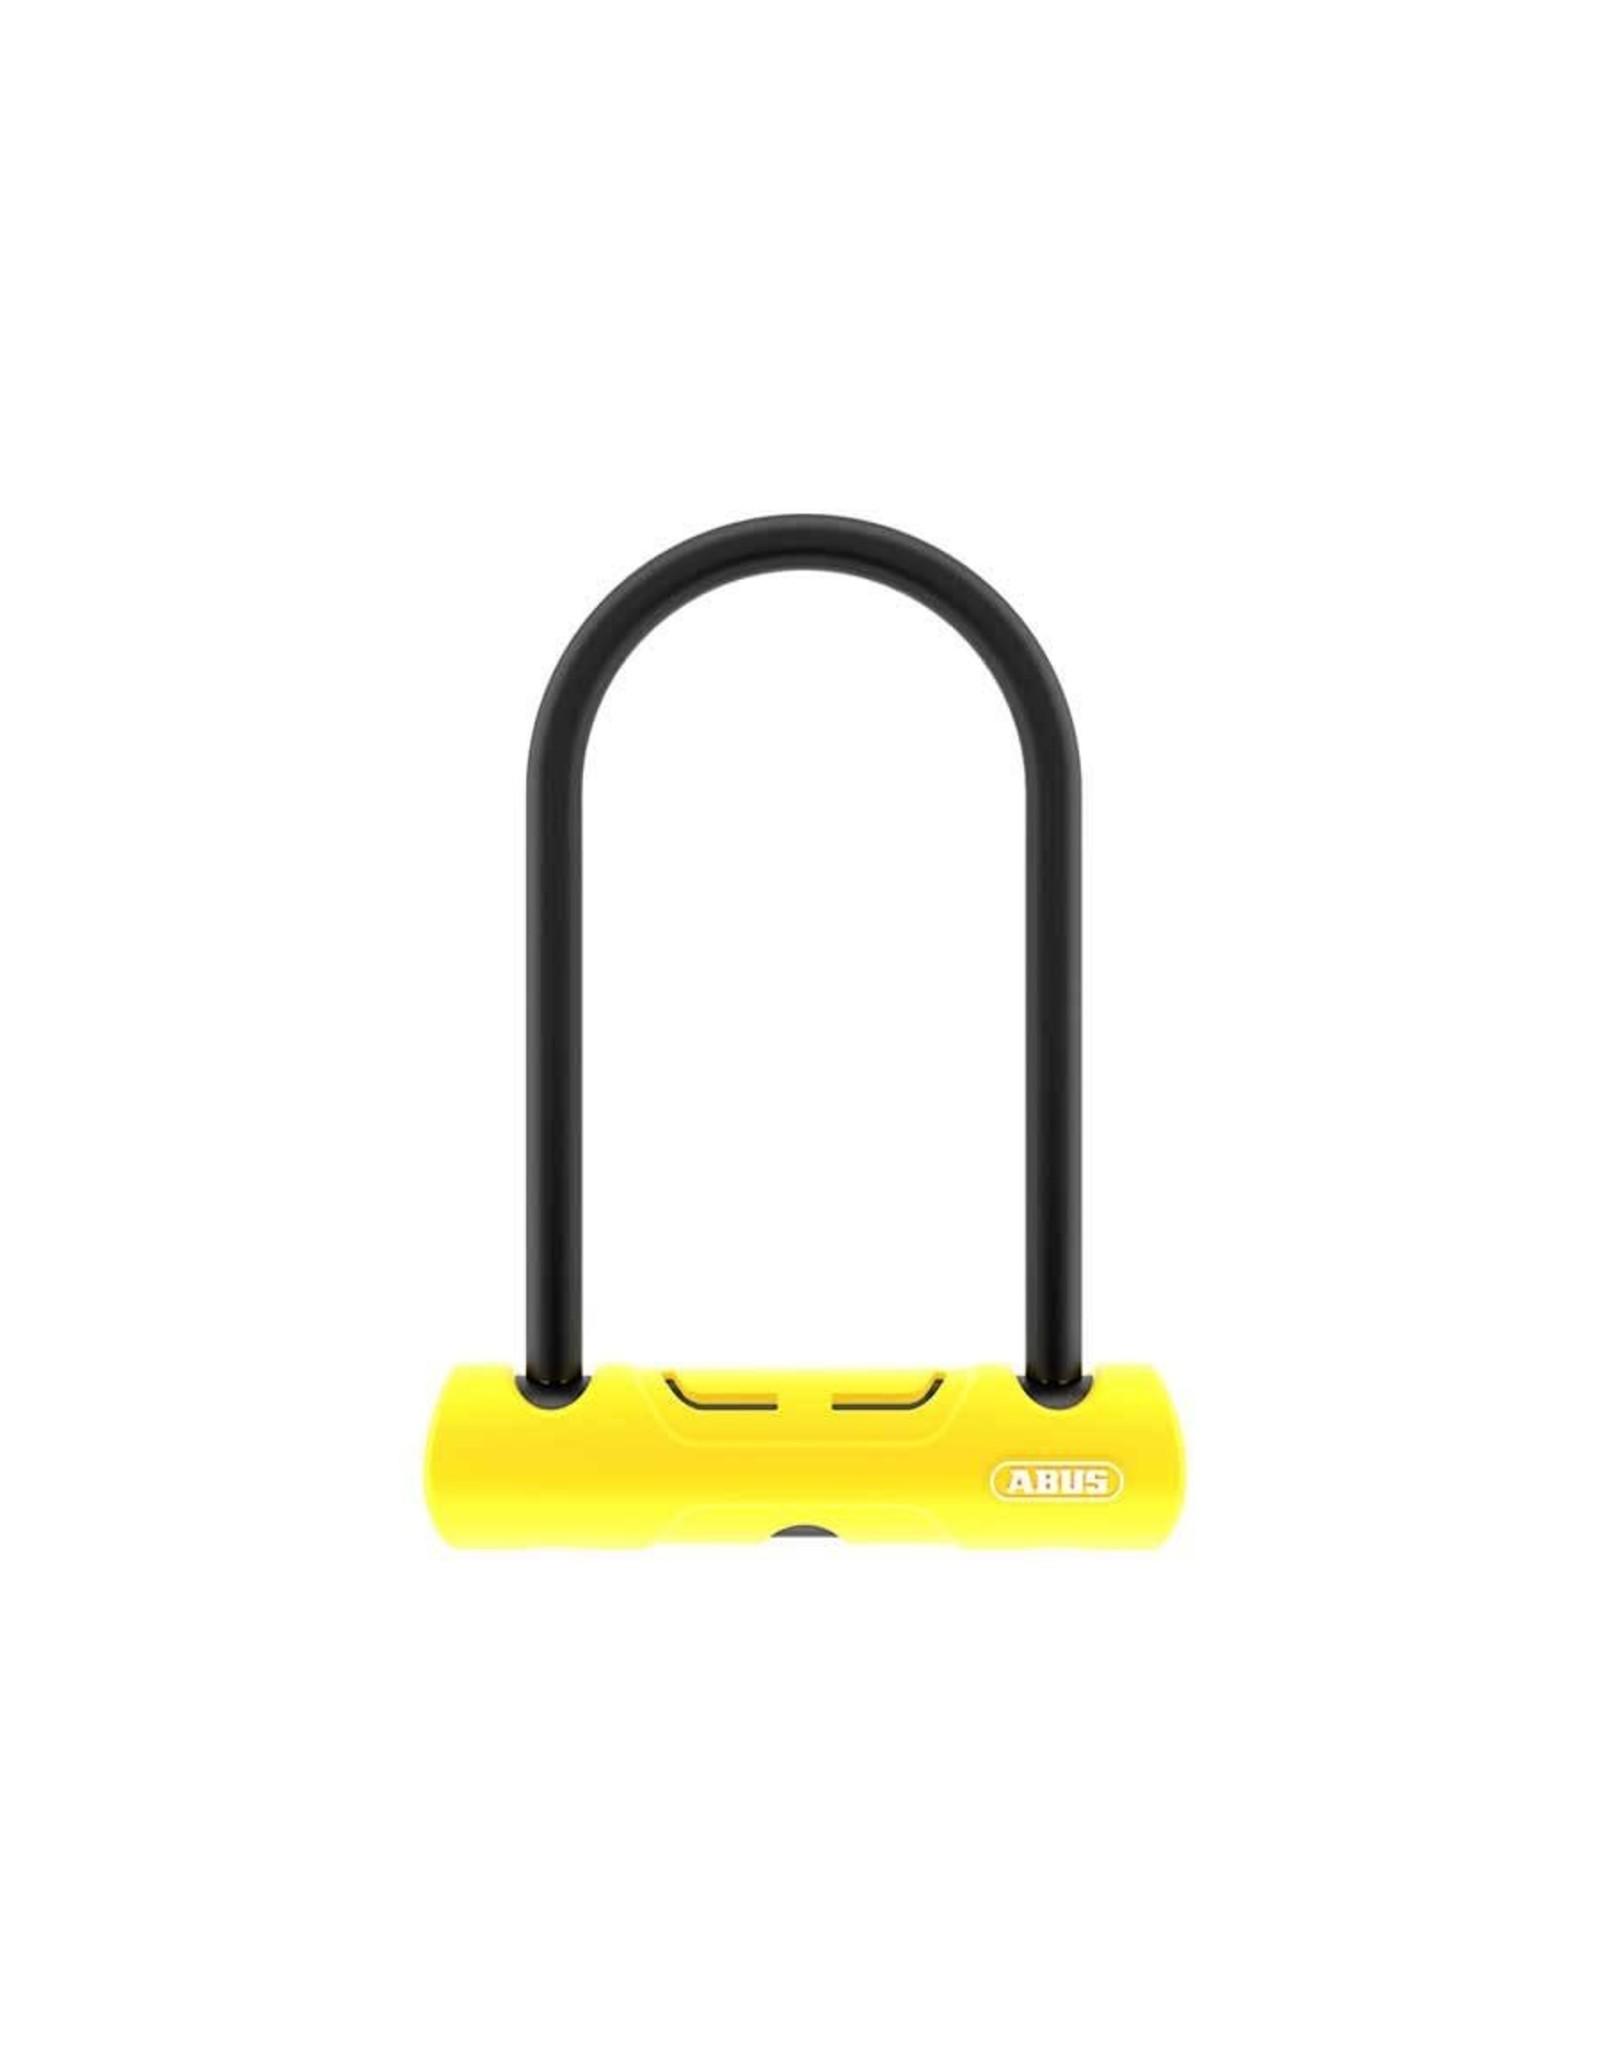 Abus Abus, 402, U-Lock, Key, 150 x 160mm, Yellow